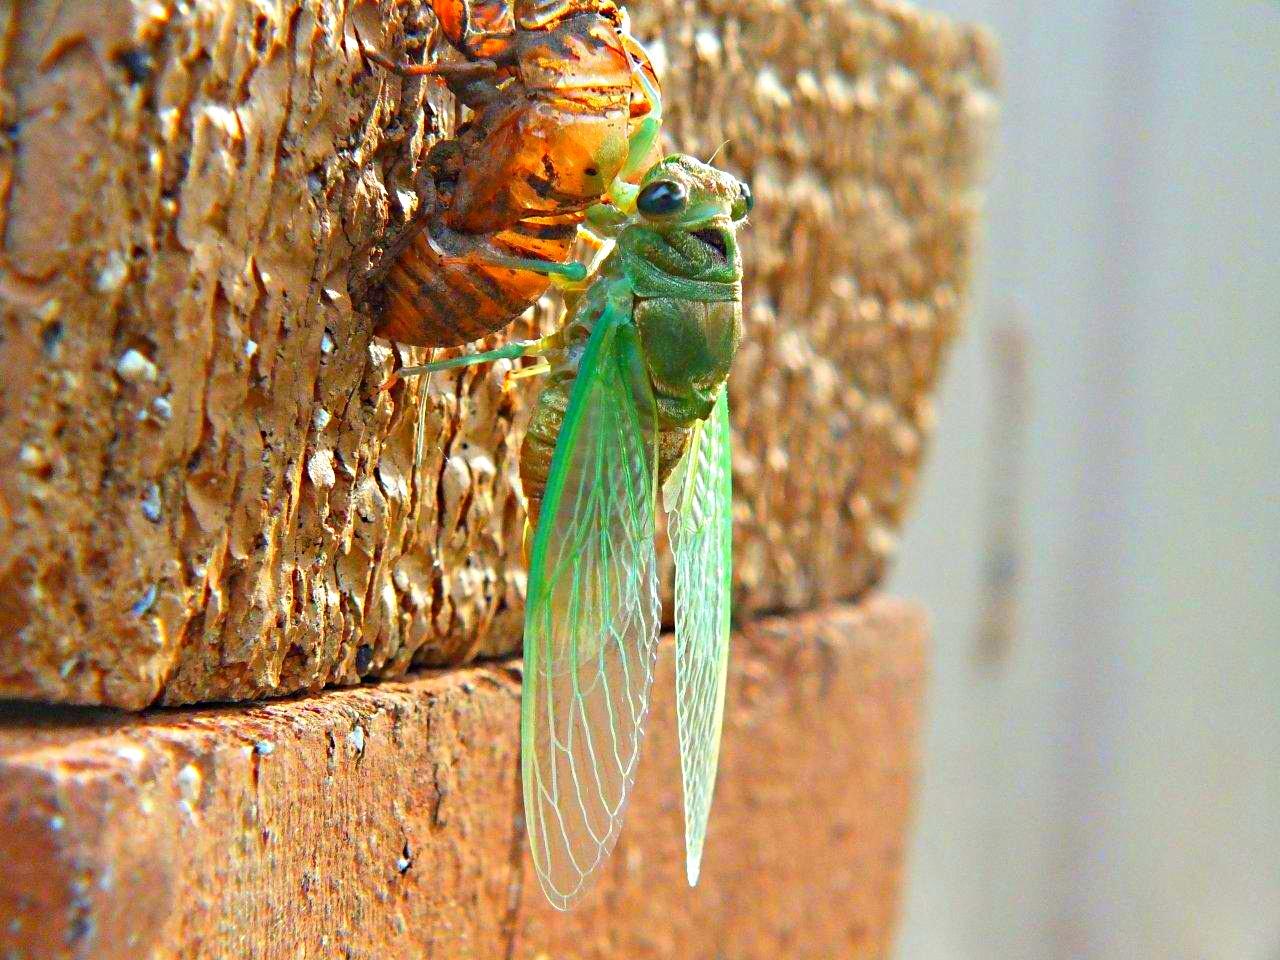 Cicada Emerged... by Thomas Peace 2013